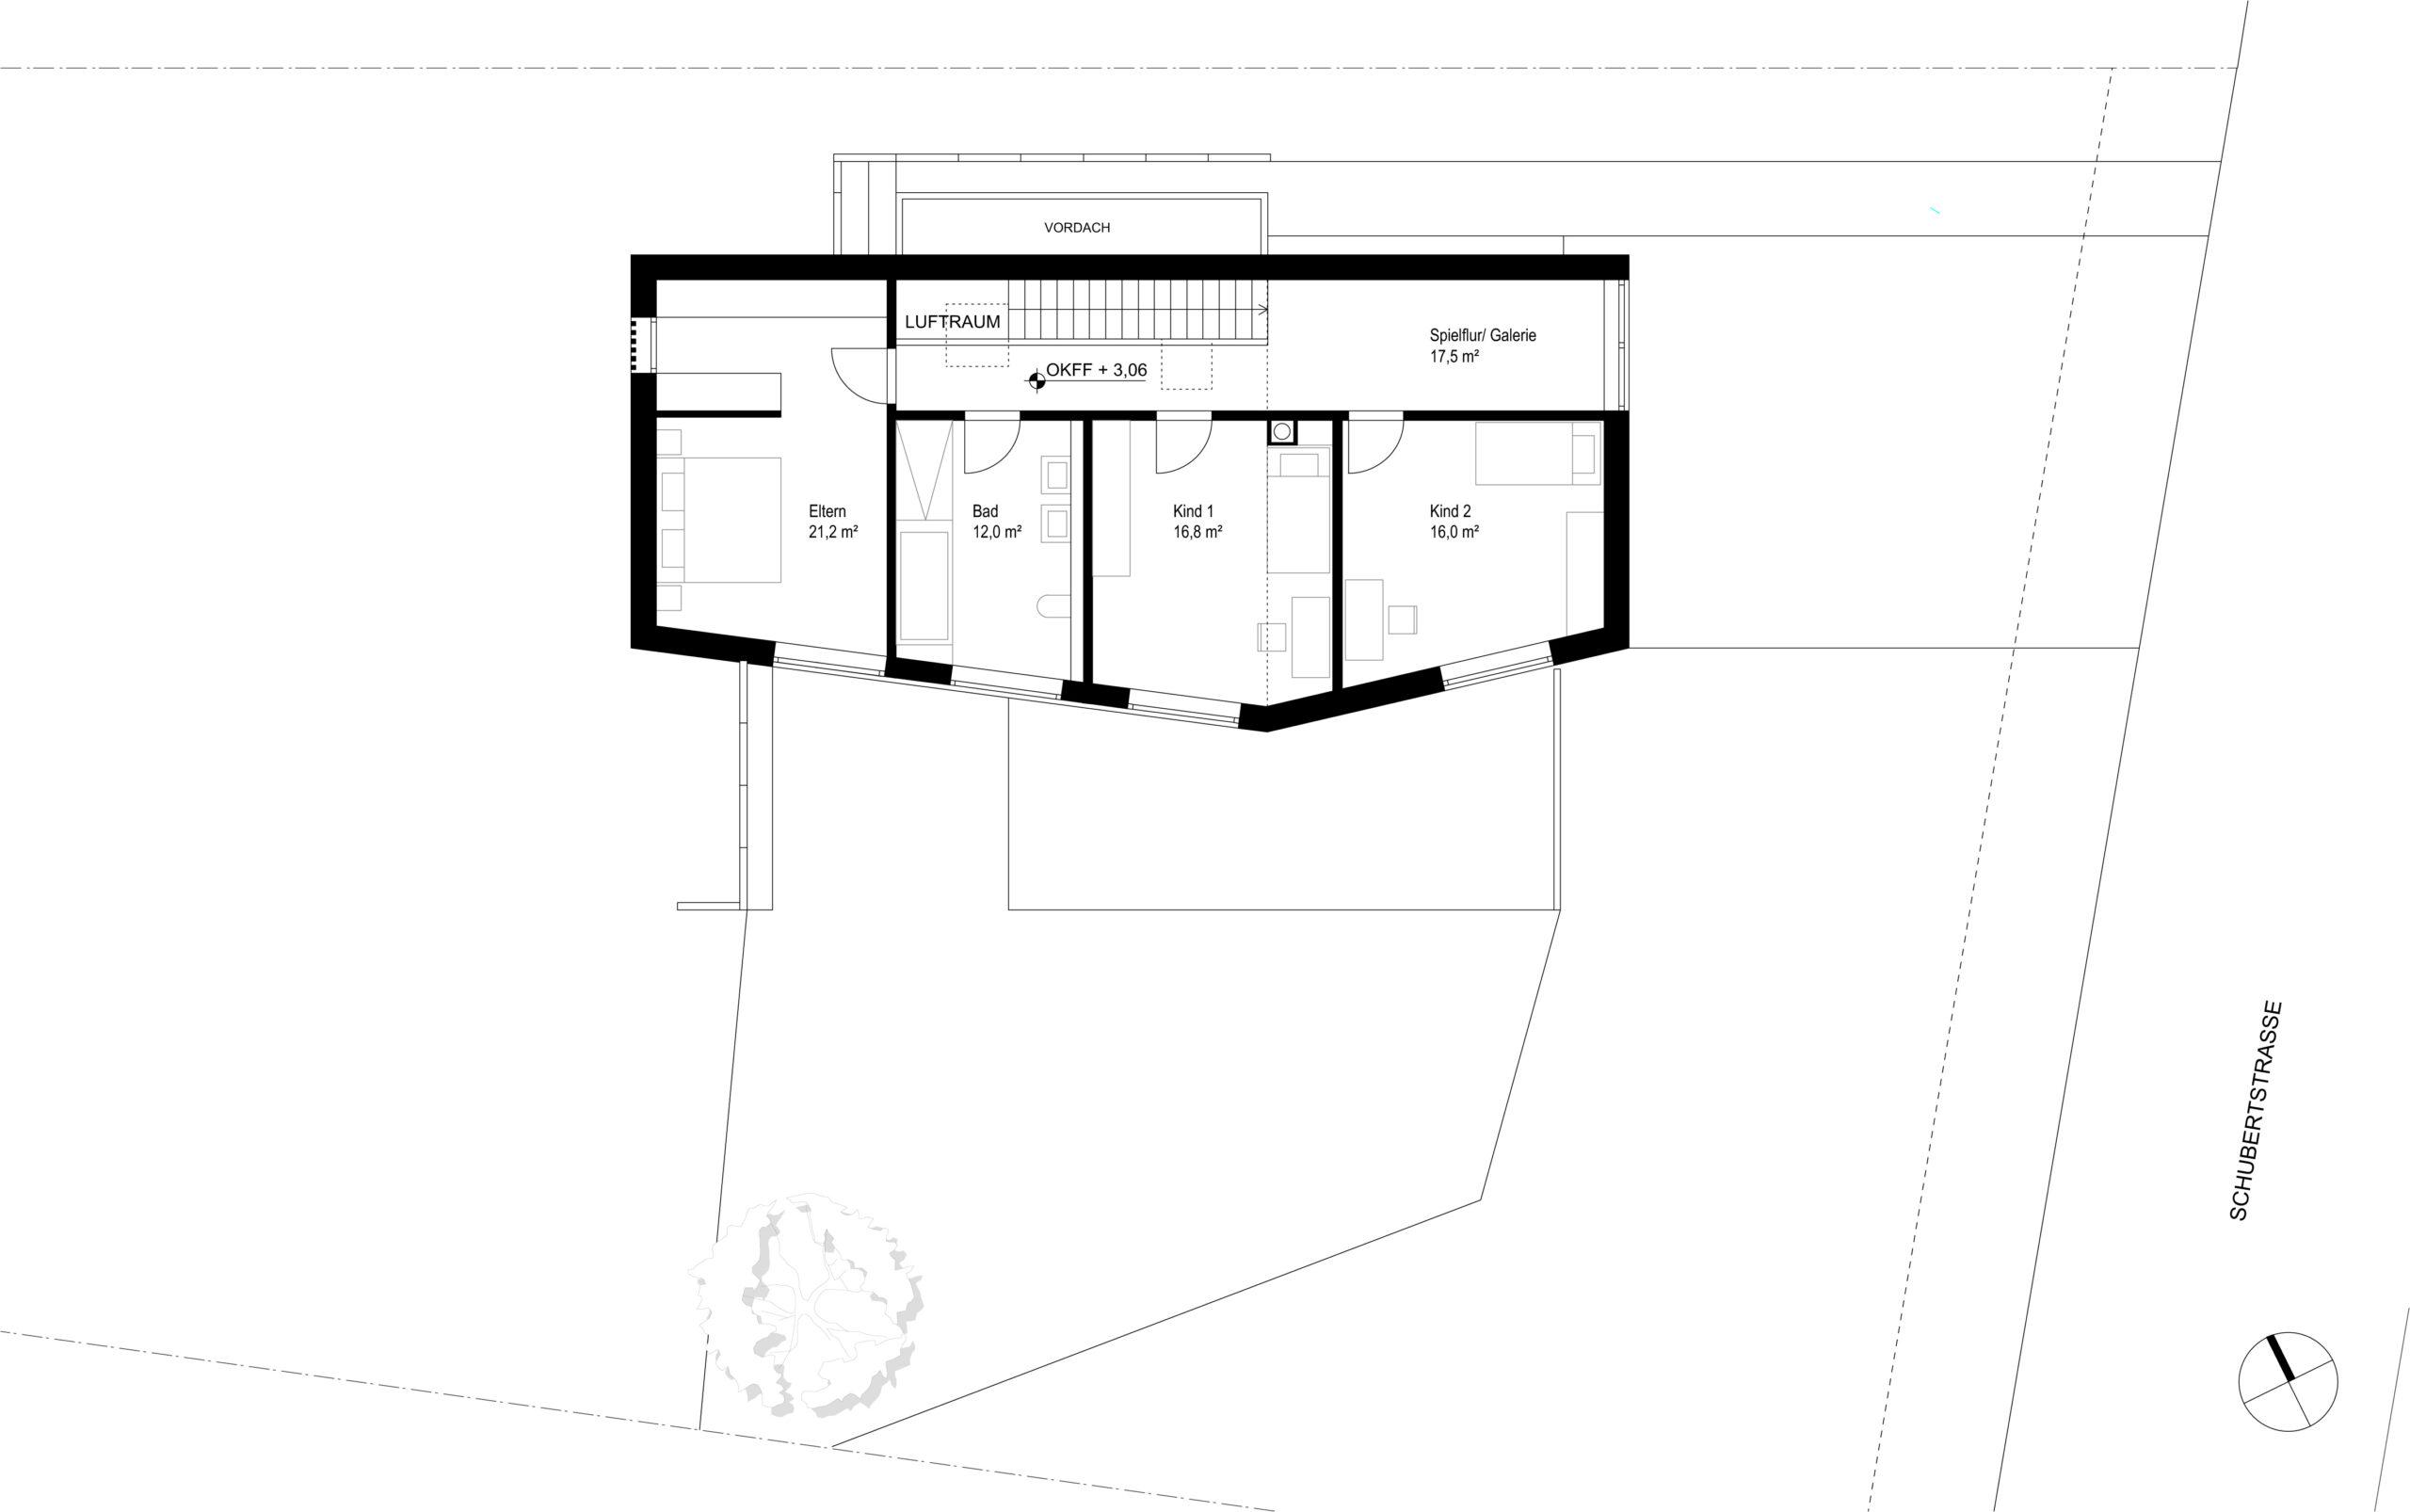 235_Wohnhaus D_Grundriss Obergeschoss_FFM-ARCHITEKTEN